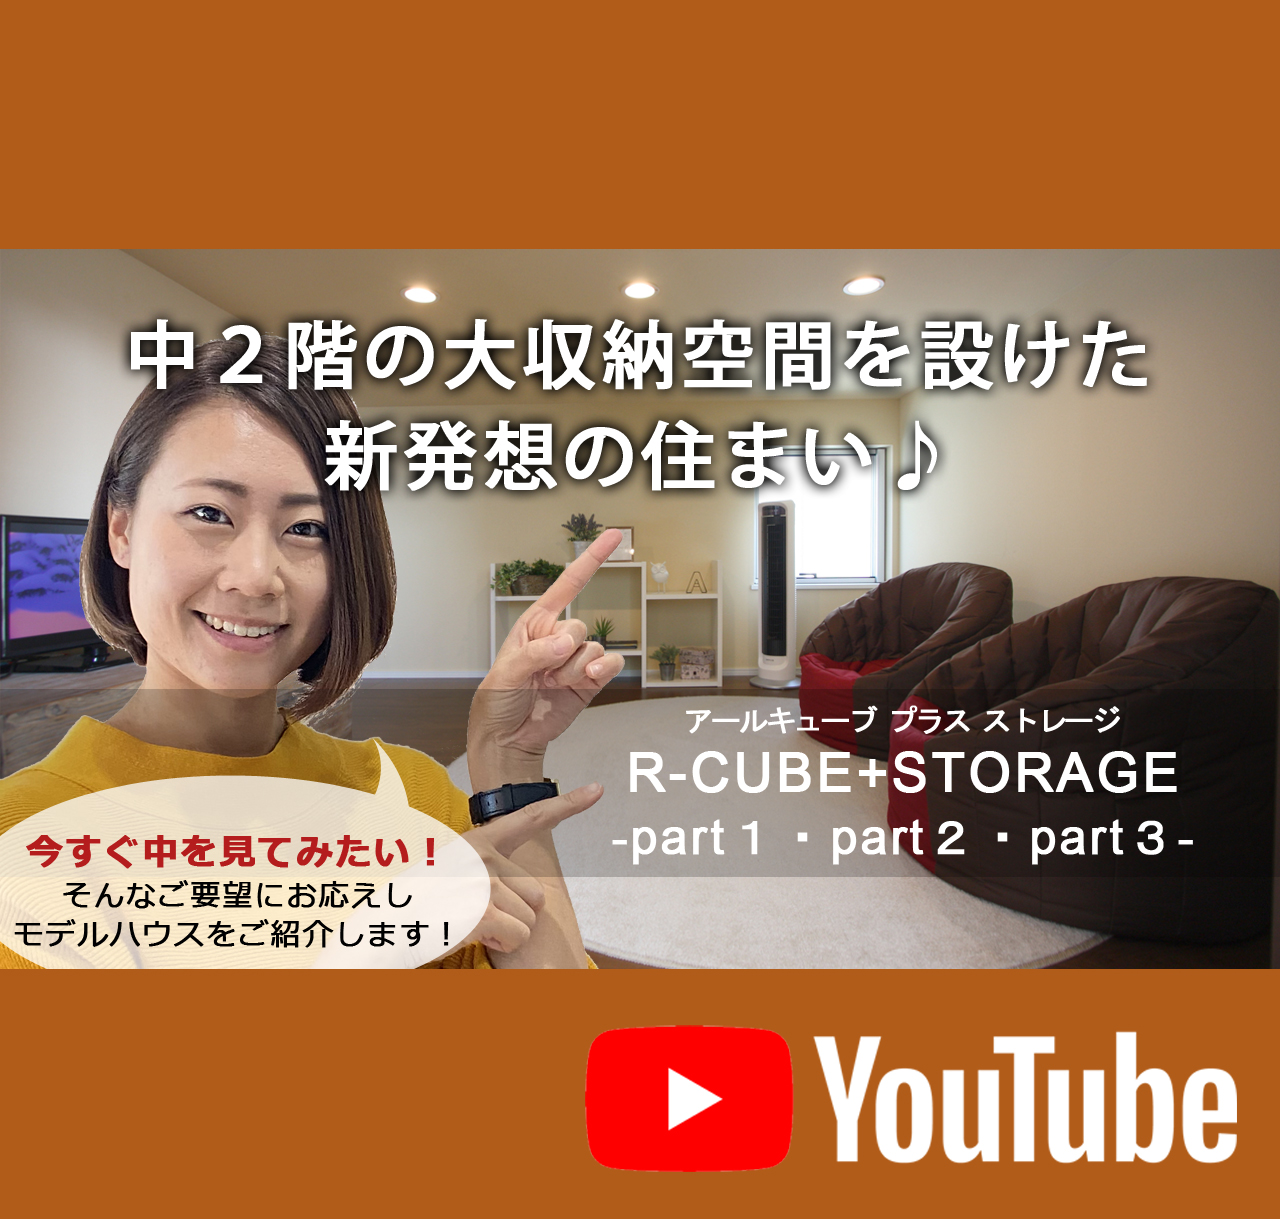 Youtube限定!WEB見学会 R-CUBE+MEZZANINE<!--高平17-->